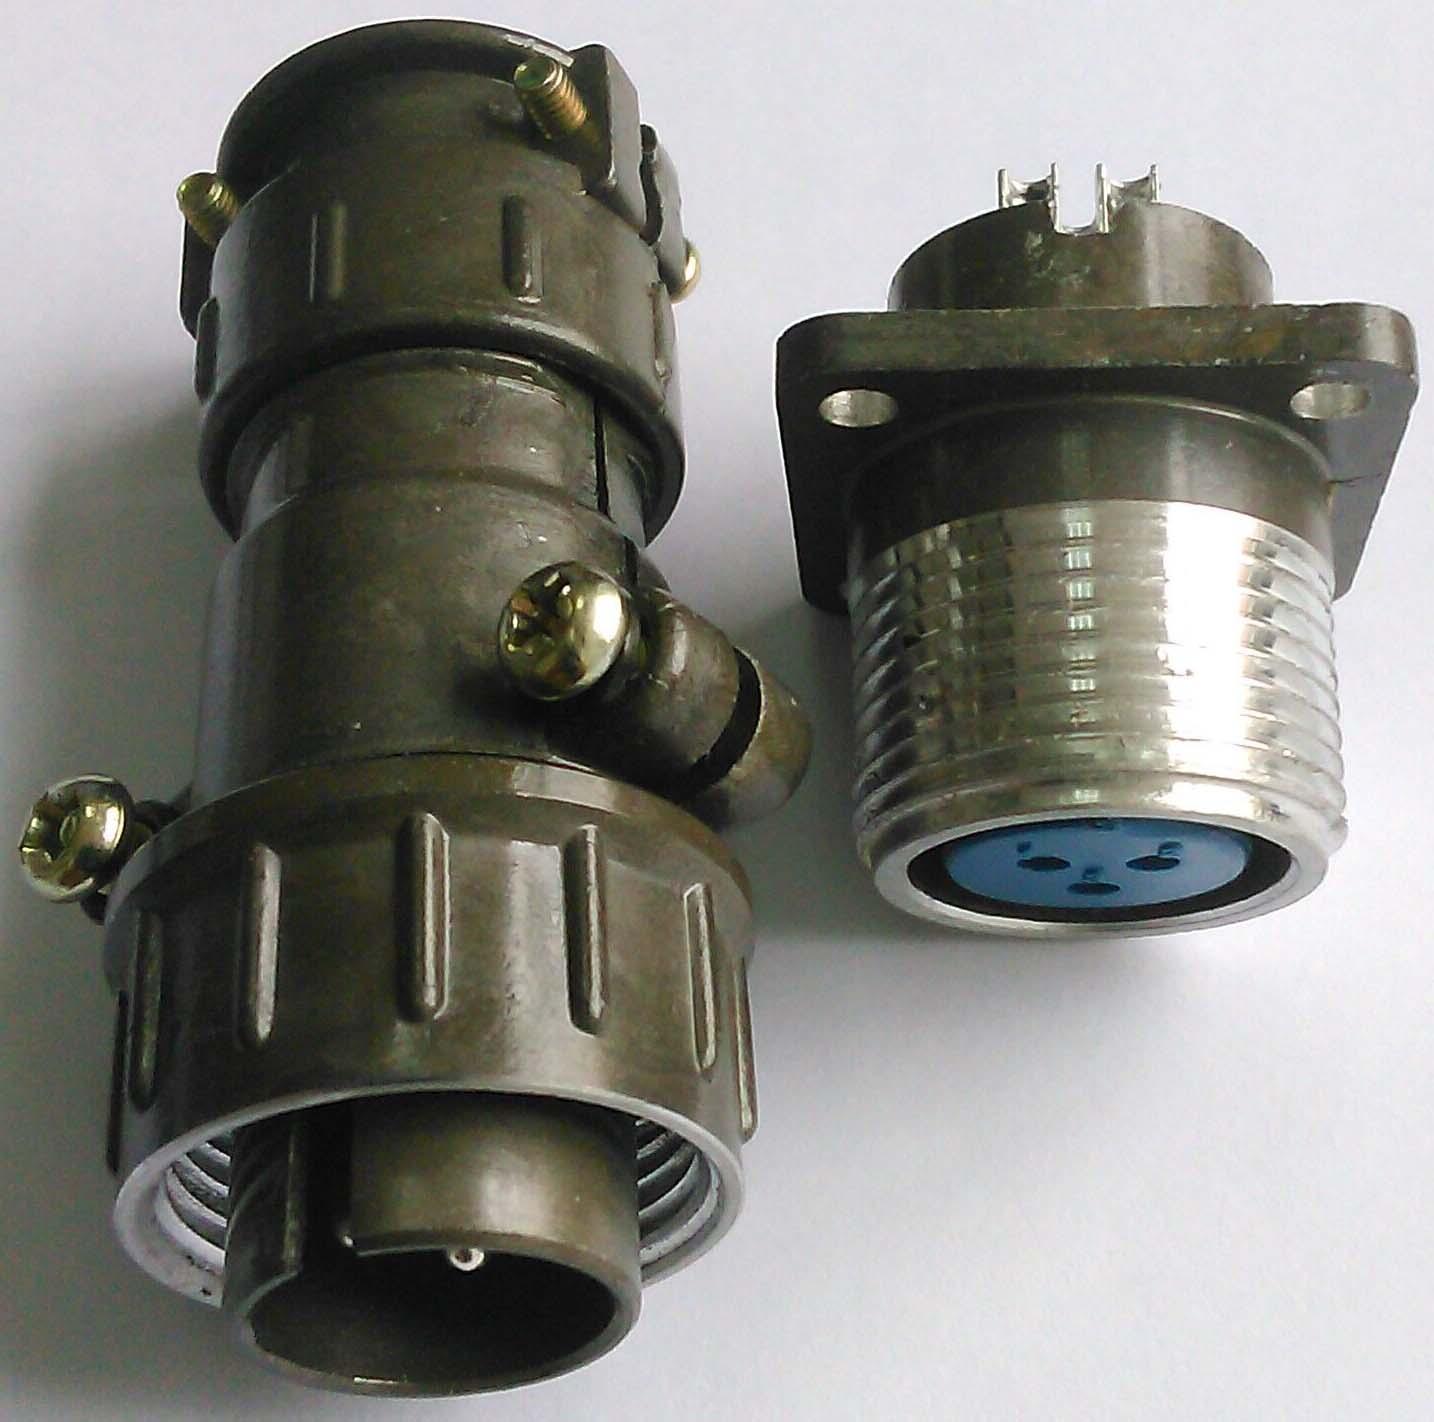 P series circular connectors 4